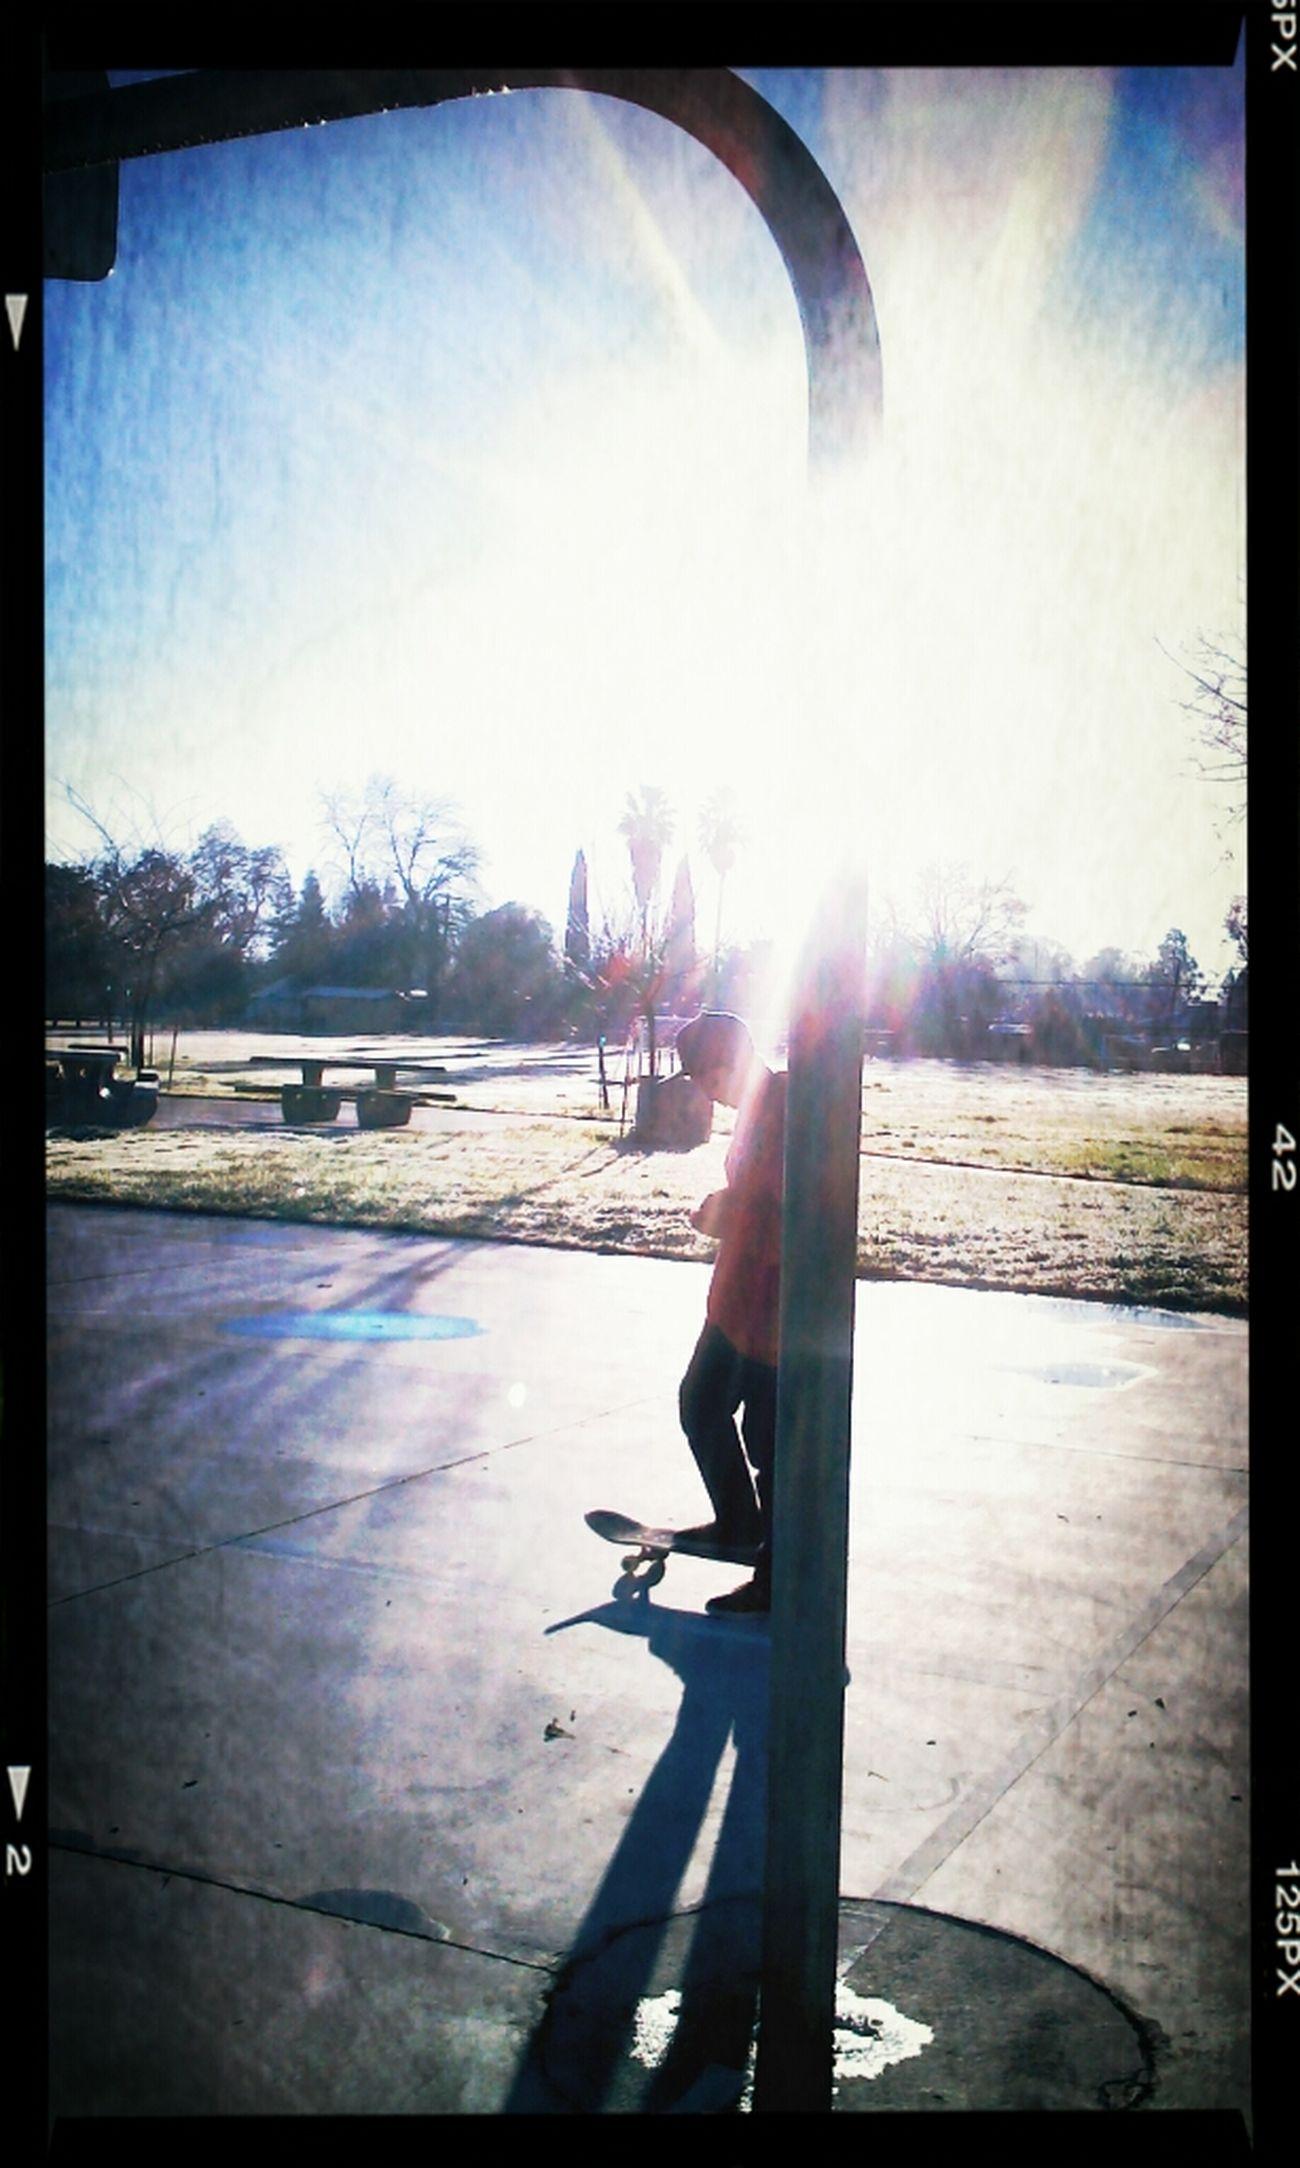 Skateboarding Early Morning Good Morning Early Morning Frost